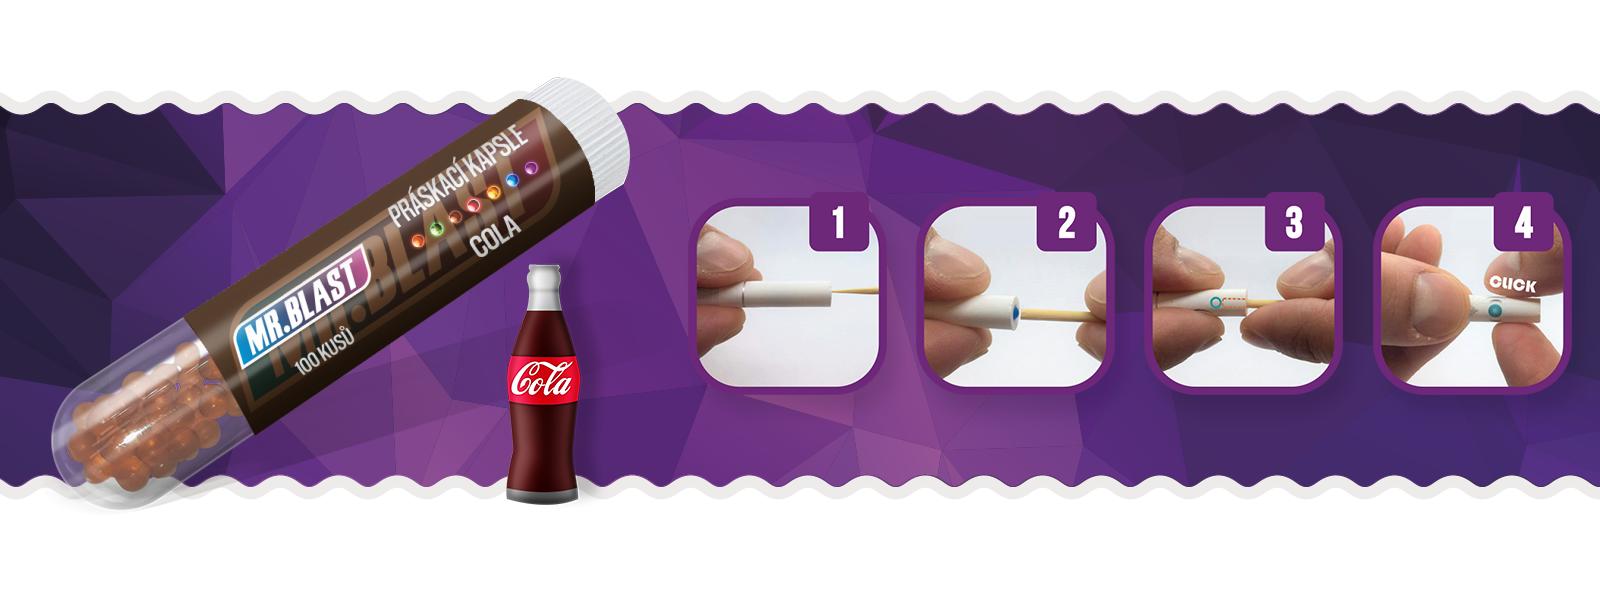 Cola_banner_1